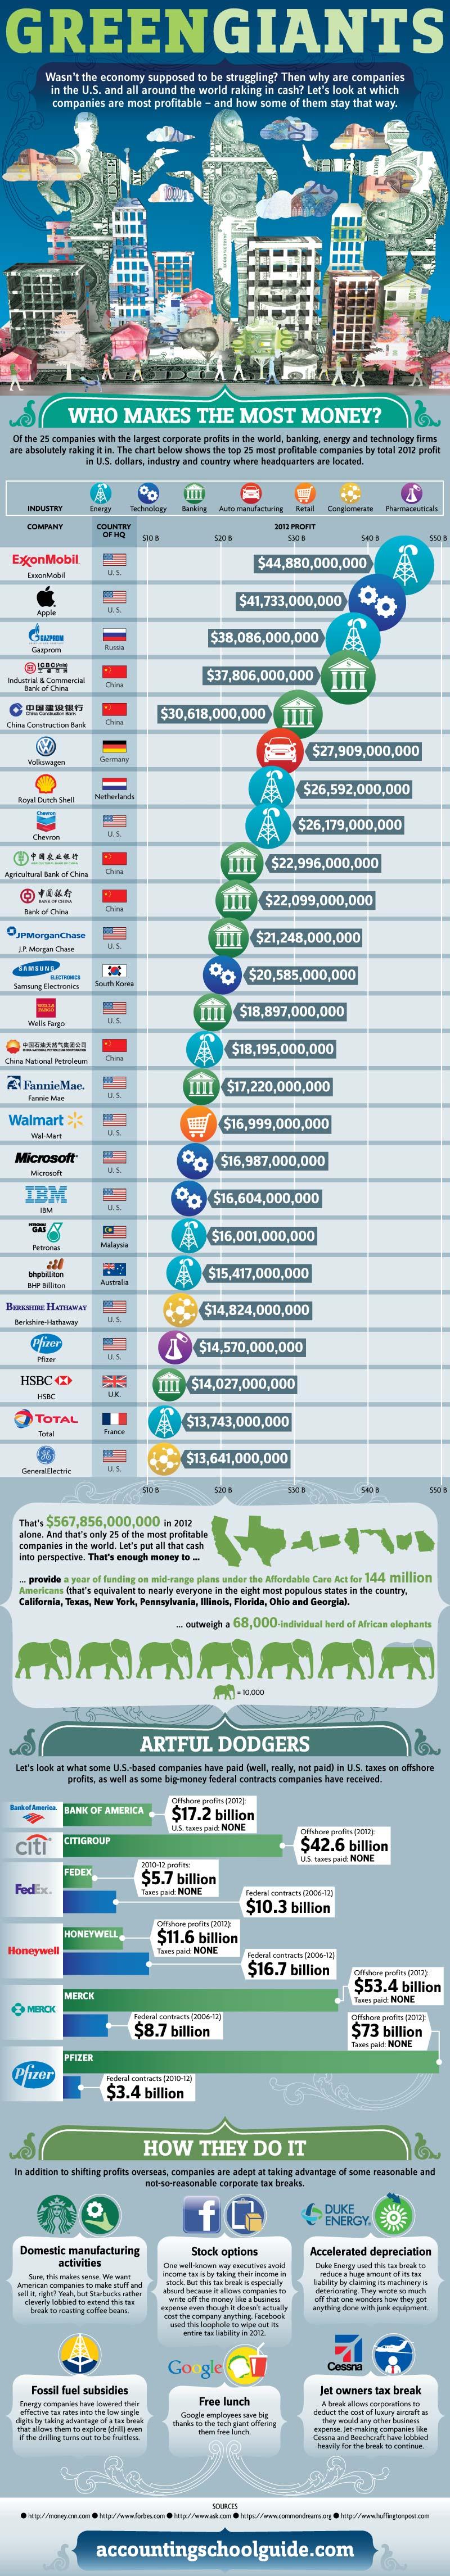 Most Profitable Companies 2012-Infographic